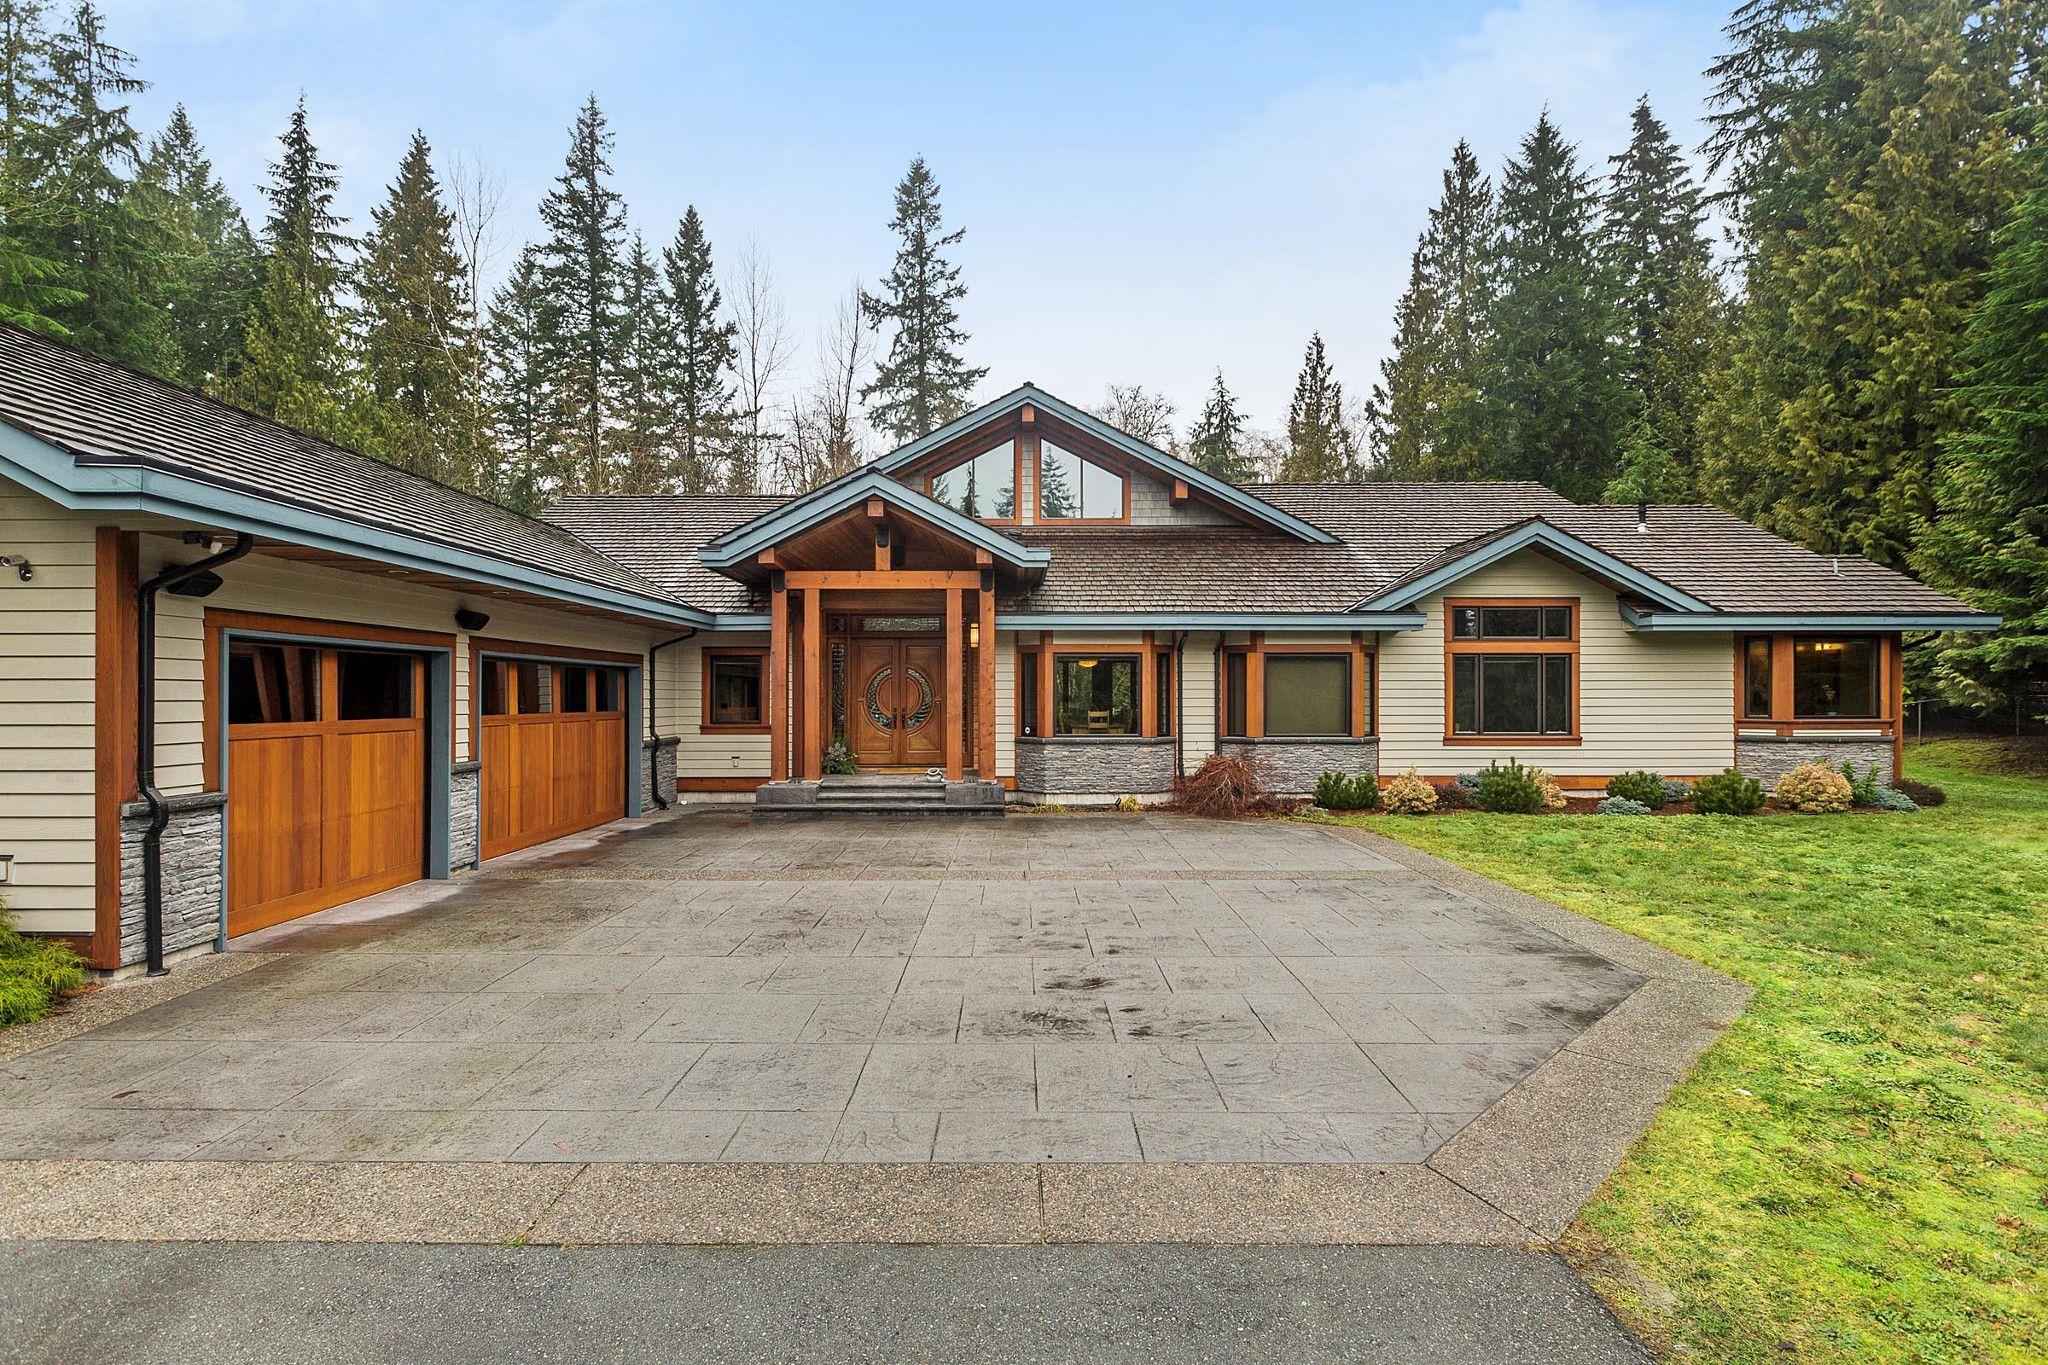 Main Photo: 27289 110 Avenue in Maple Ridge: Whonnock House for sale : MLS®# R2232115